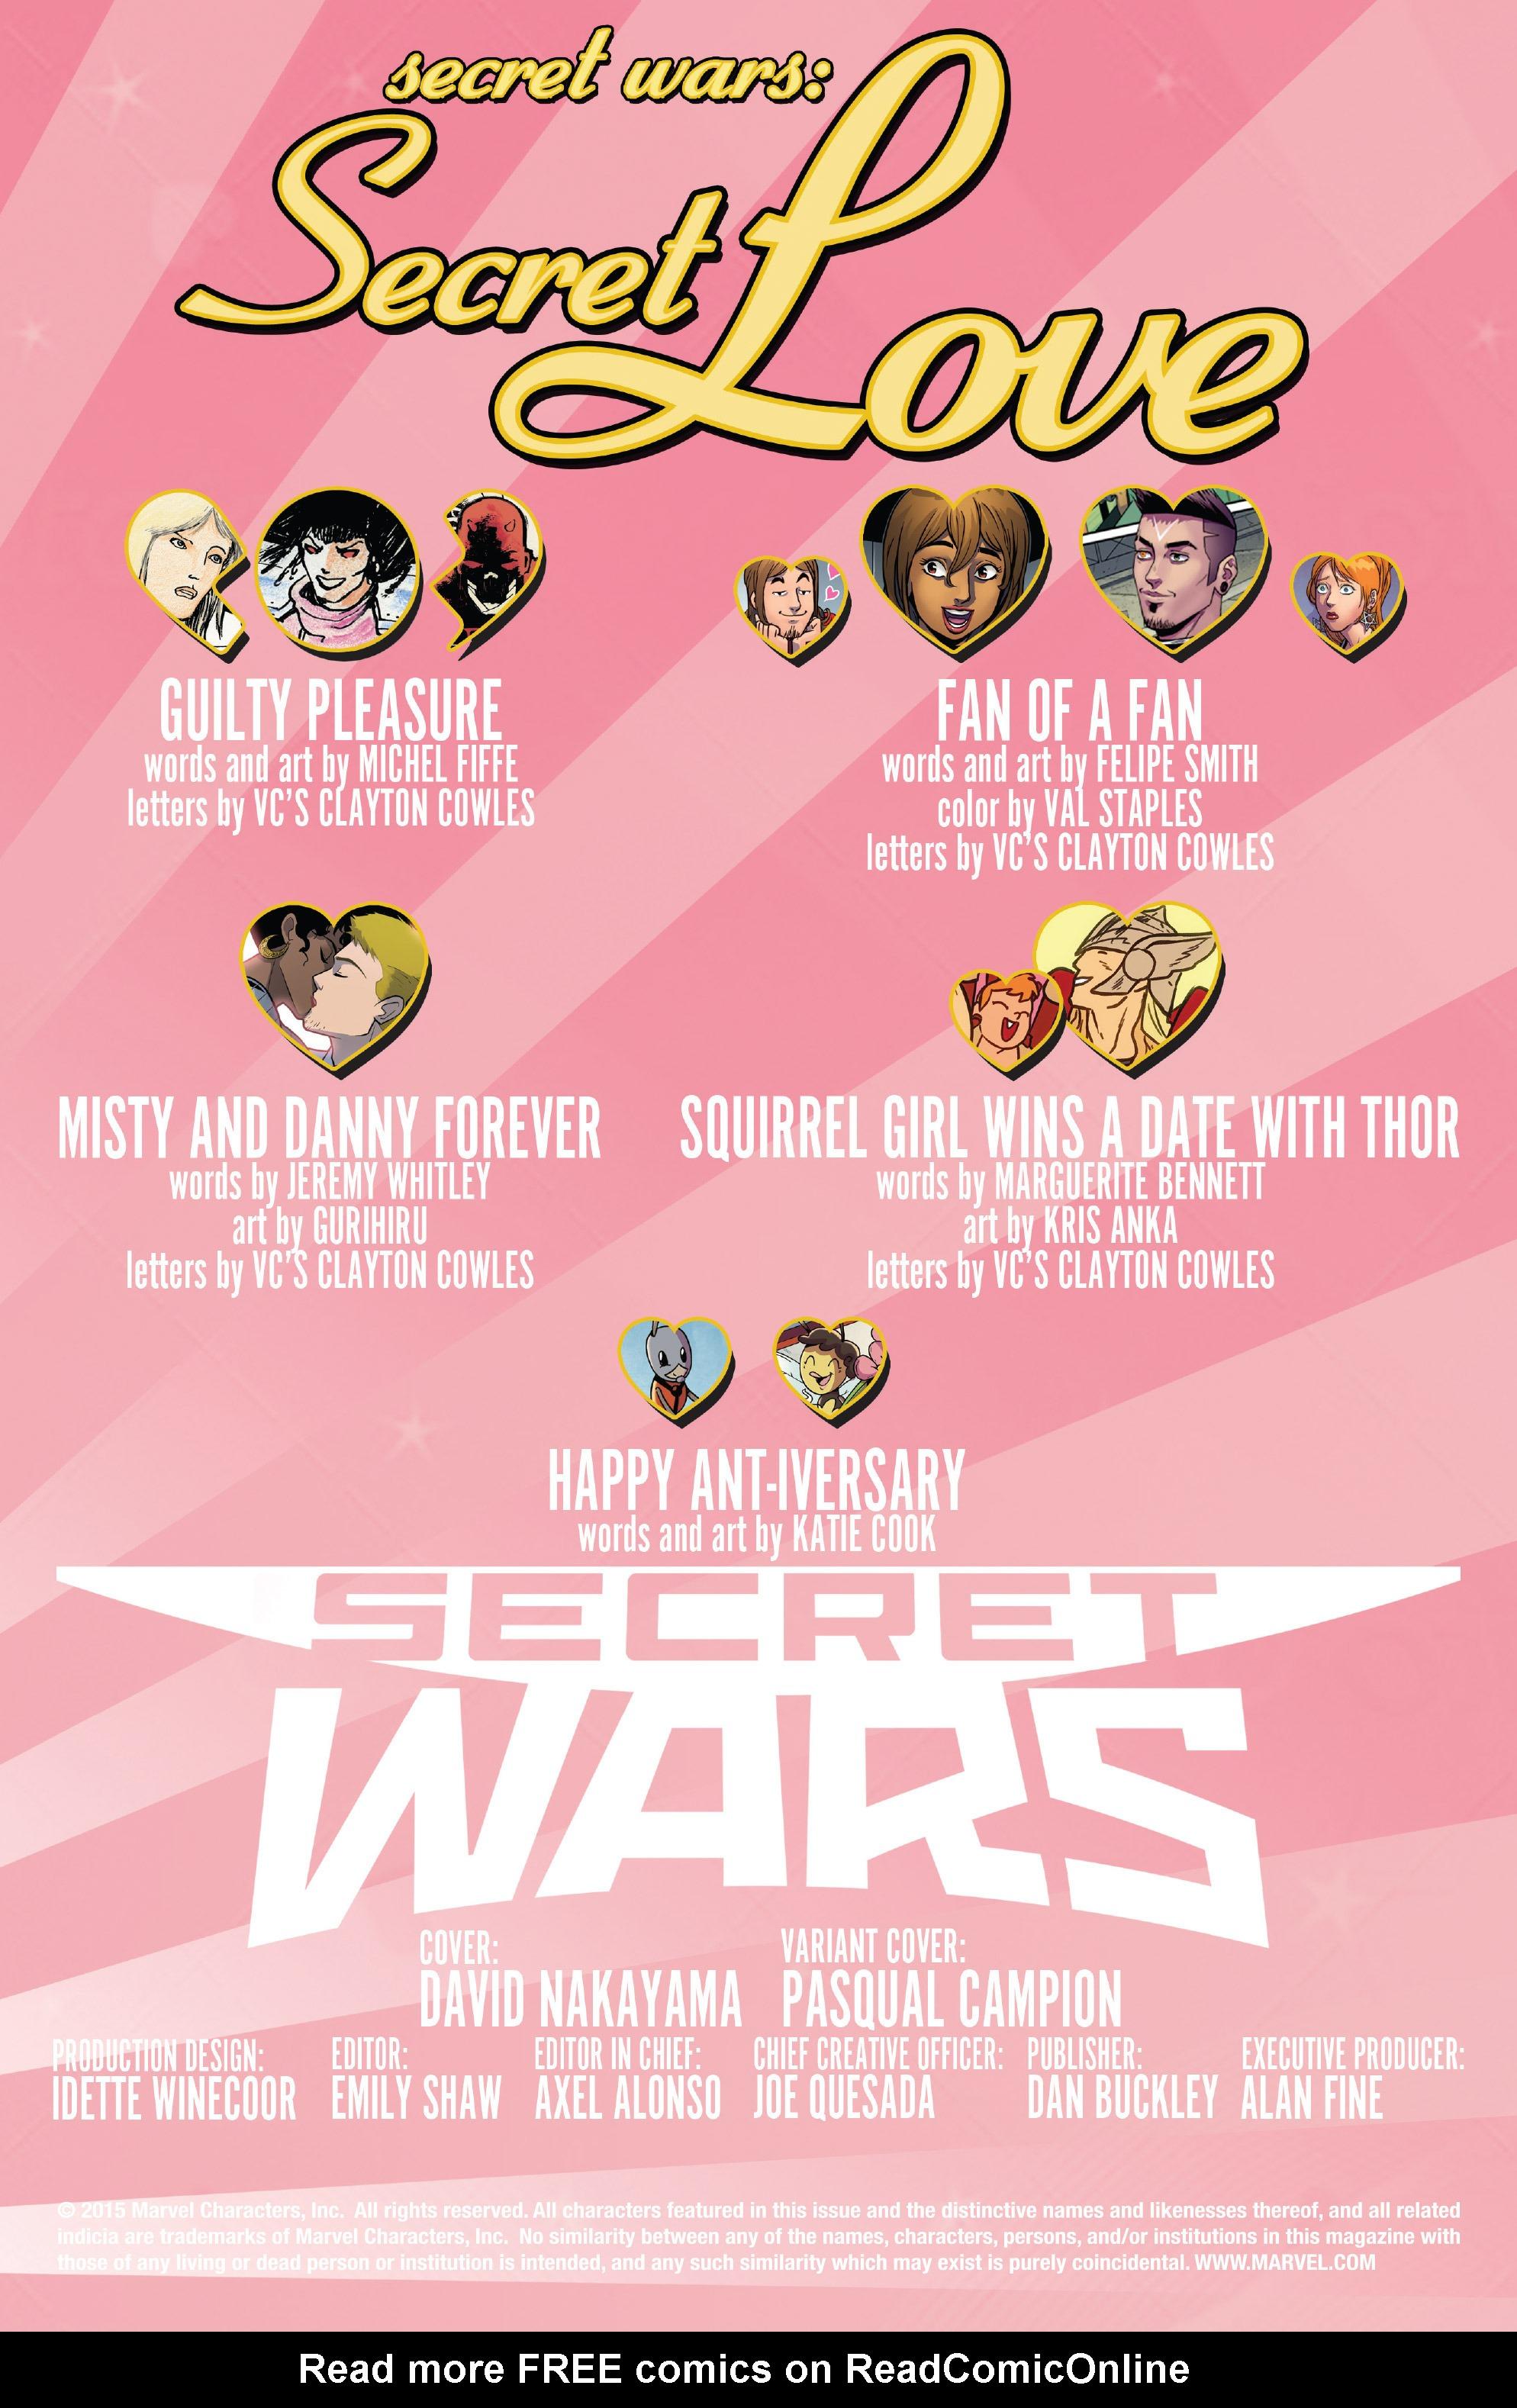 Read online Secret Wars: Secret Love comic -  Issue # Full - 2